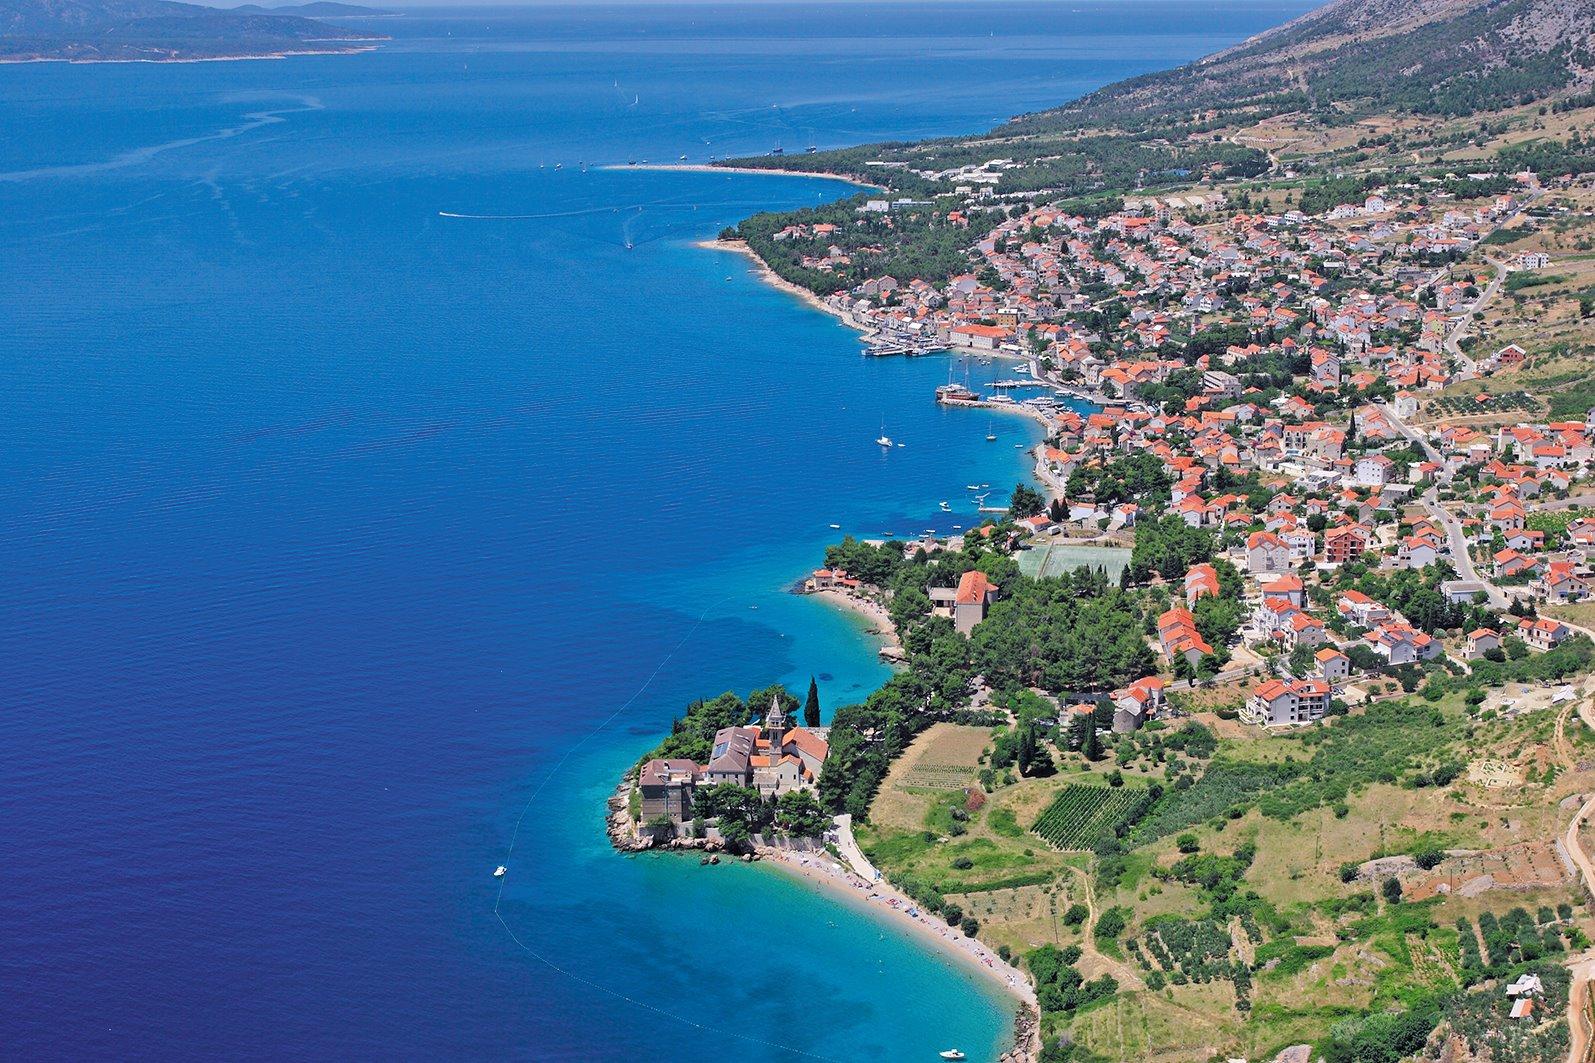 Brač (Brac), Croatia - Monterrasol private tours to Brač (Brac), Croatia. Travel agency offers custom private car tours to see Brač (Brac) in Croatia. Order custom private tour to Brač (Brac) with departure date on request.